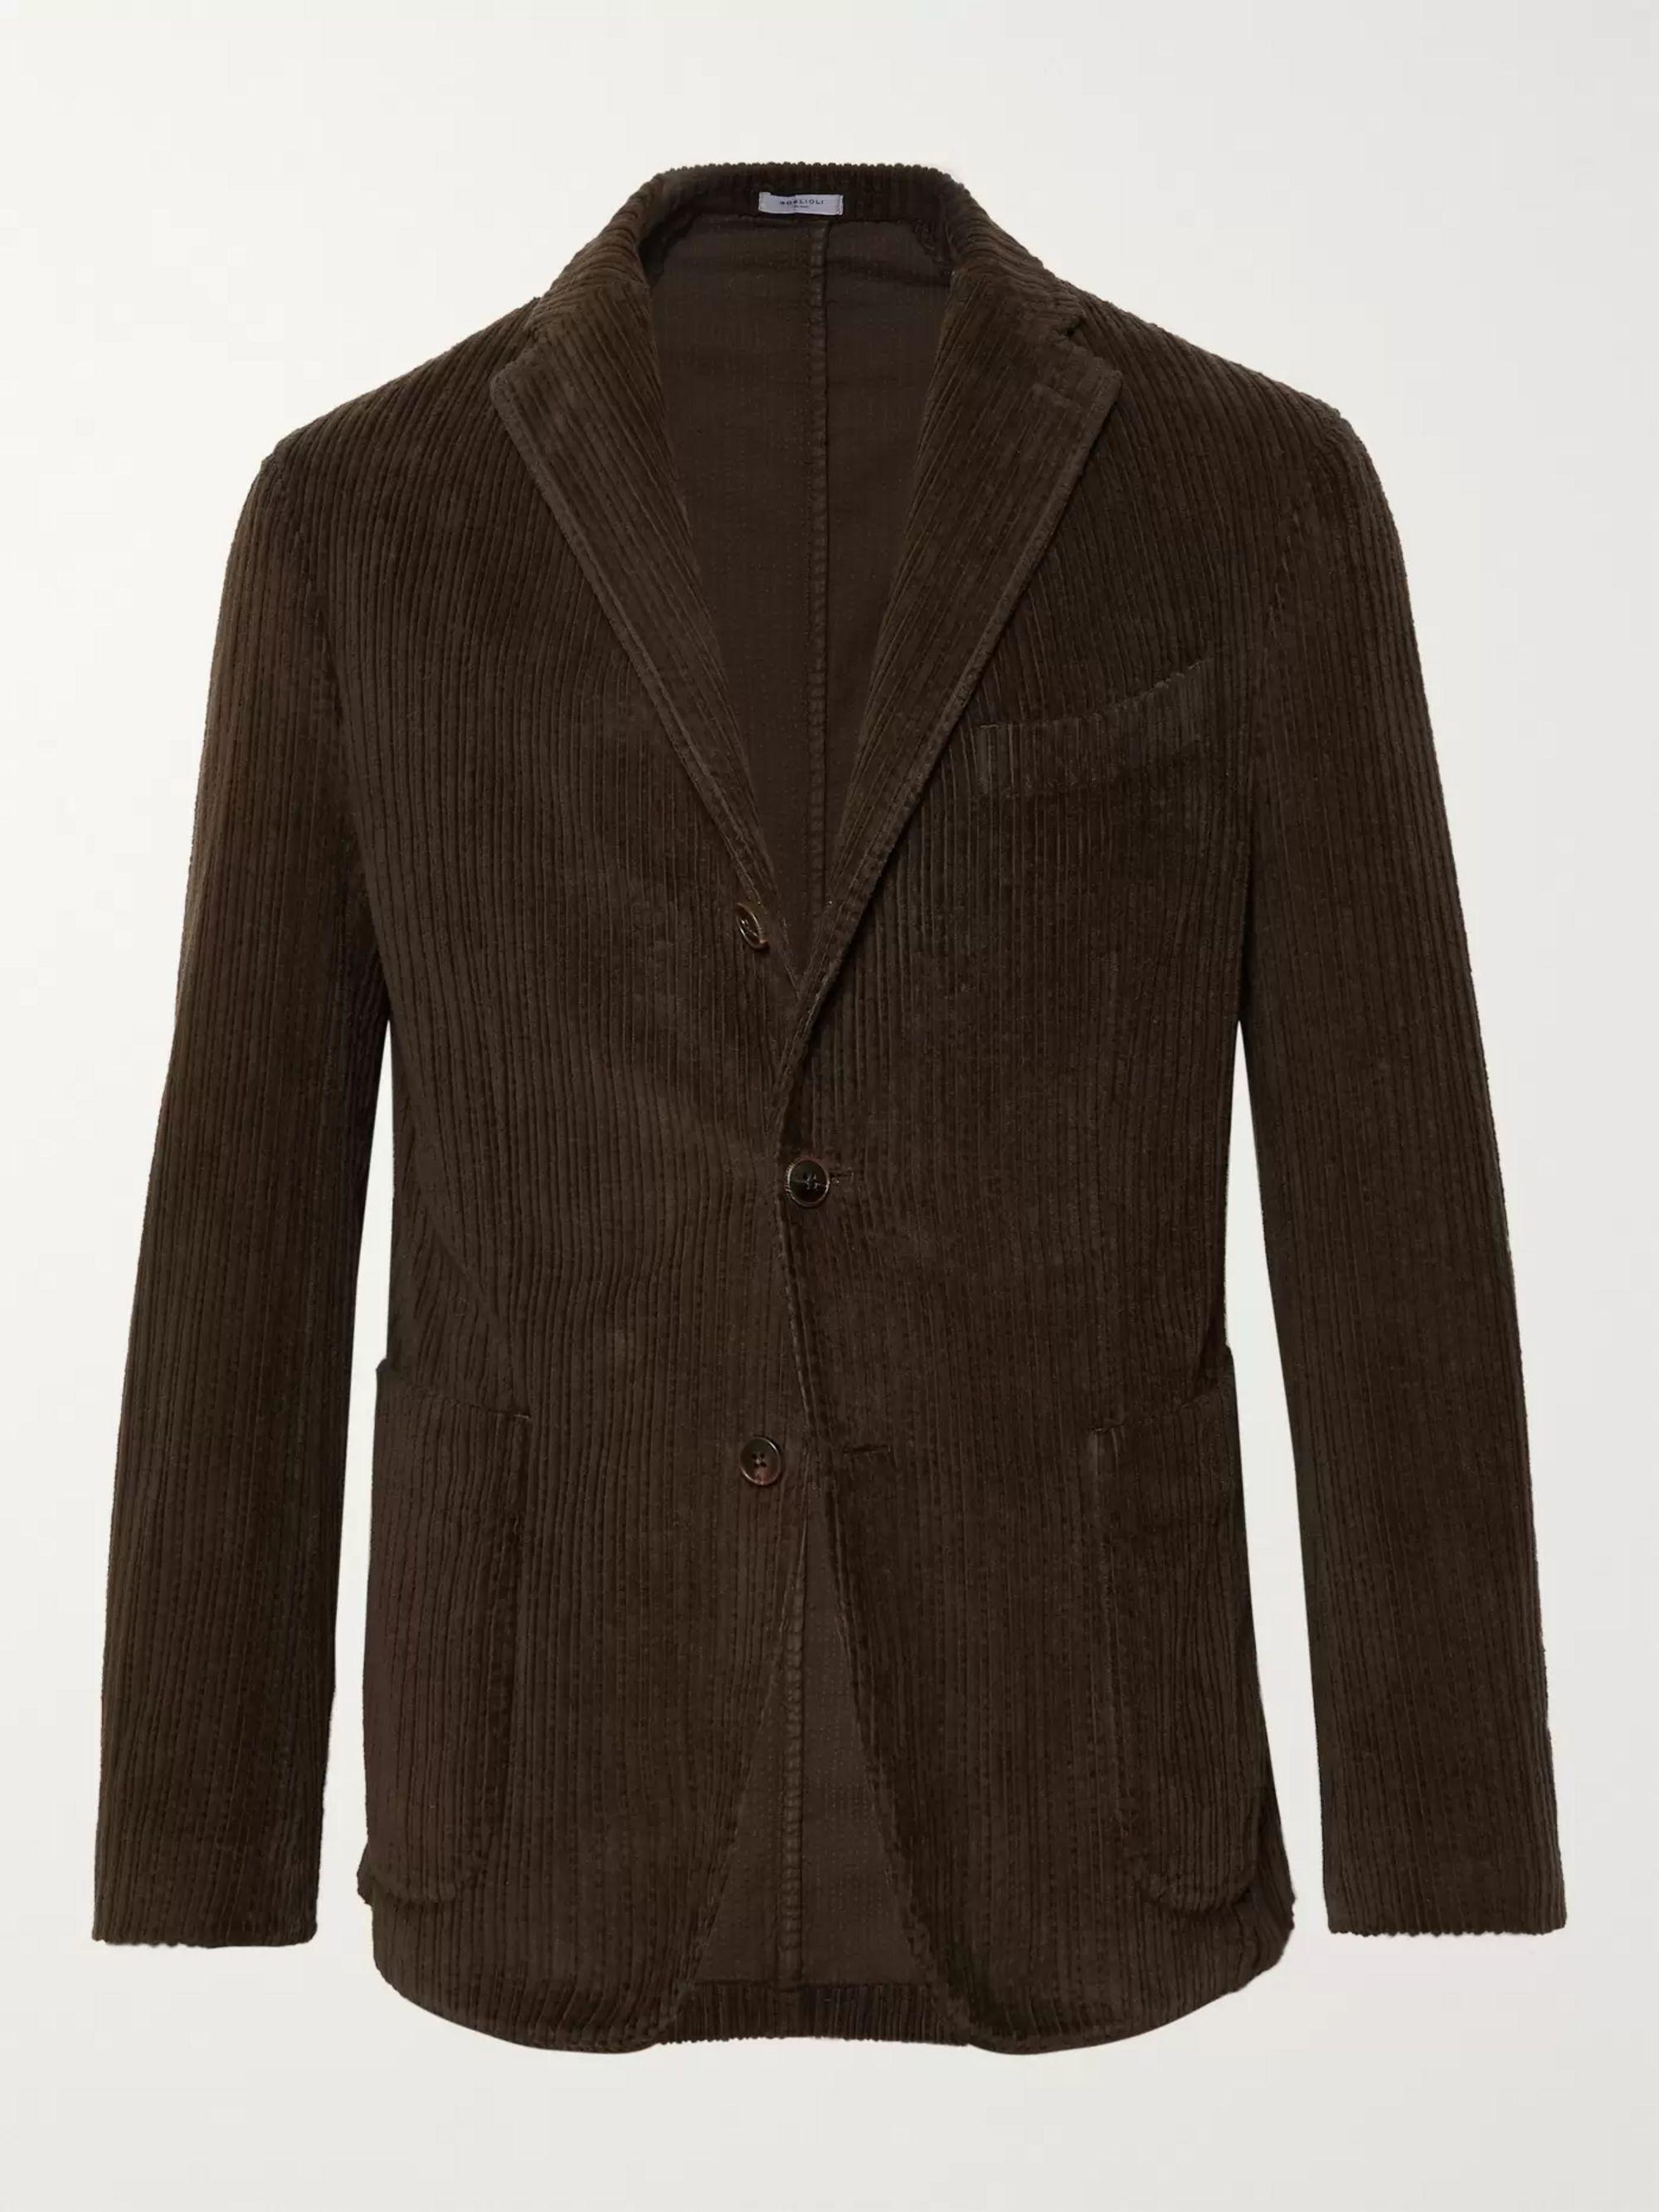 746f91b89 Dark-Green Slim-Fit K-Jacket Cotton-Corduroy Blazer